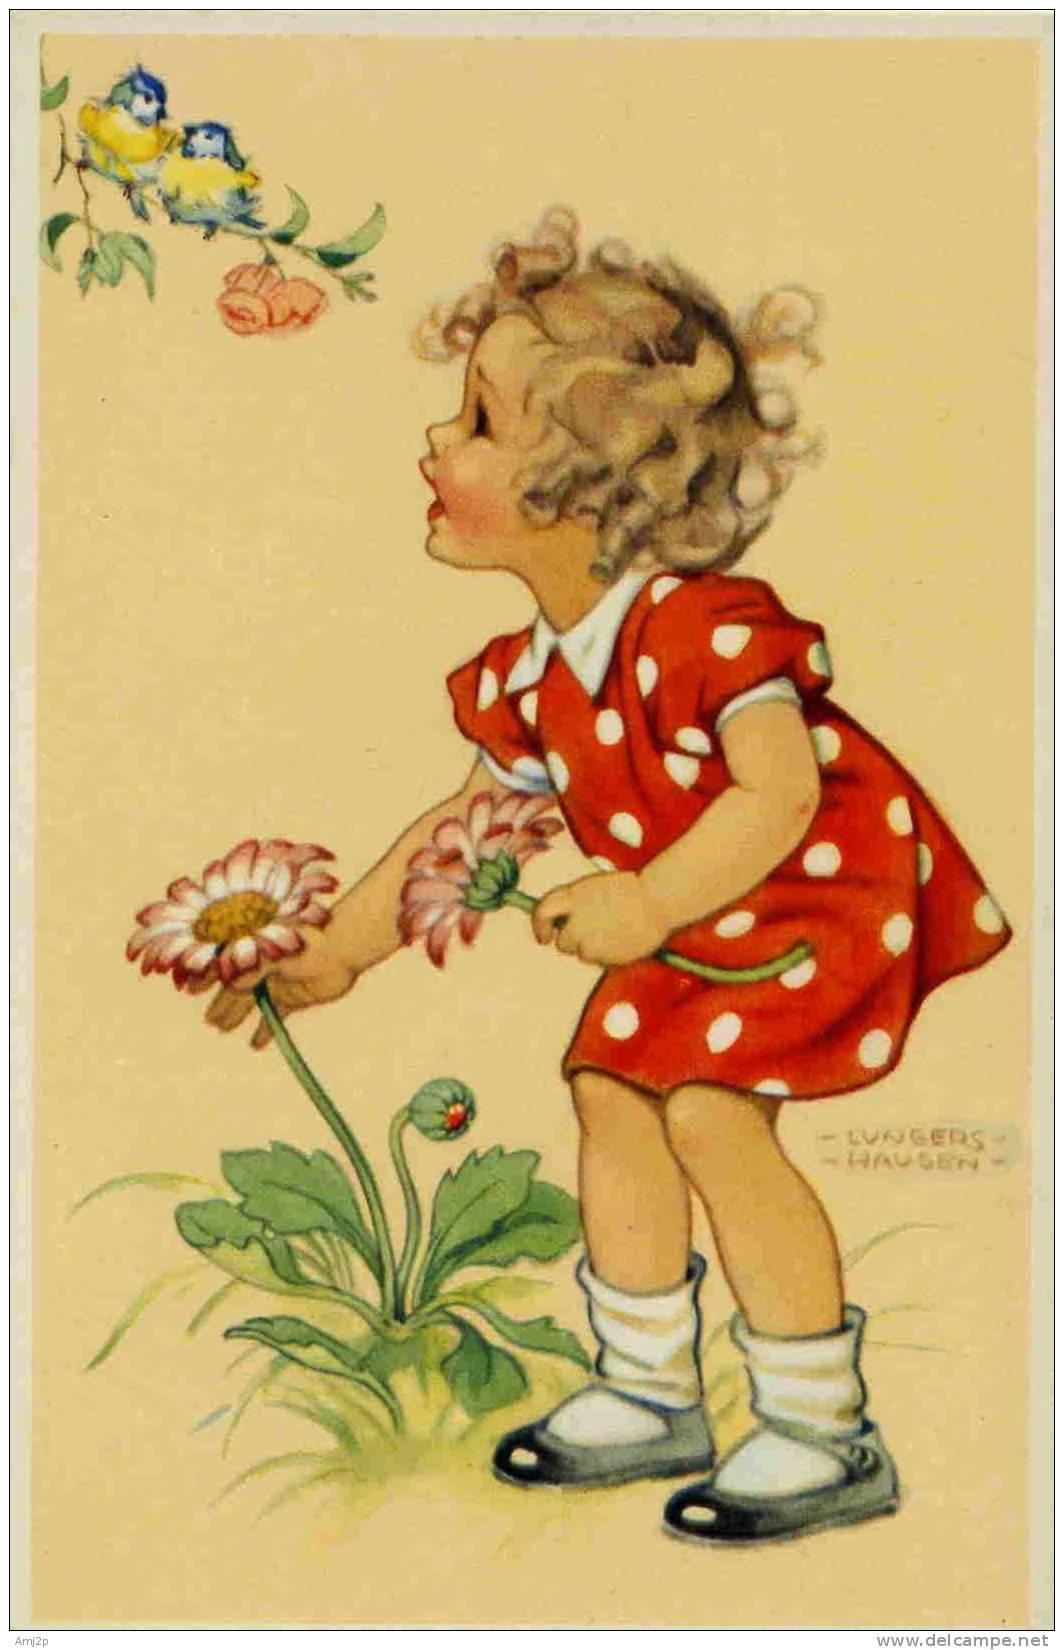 Картинки на ретро открытках 120